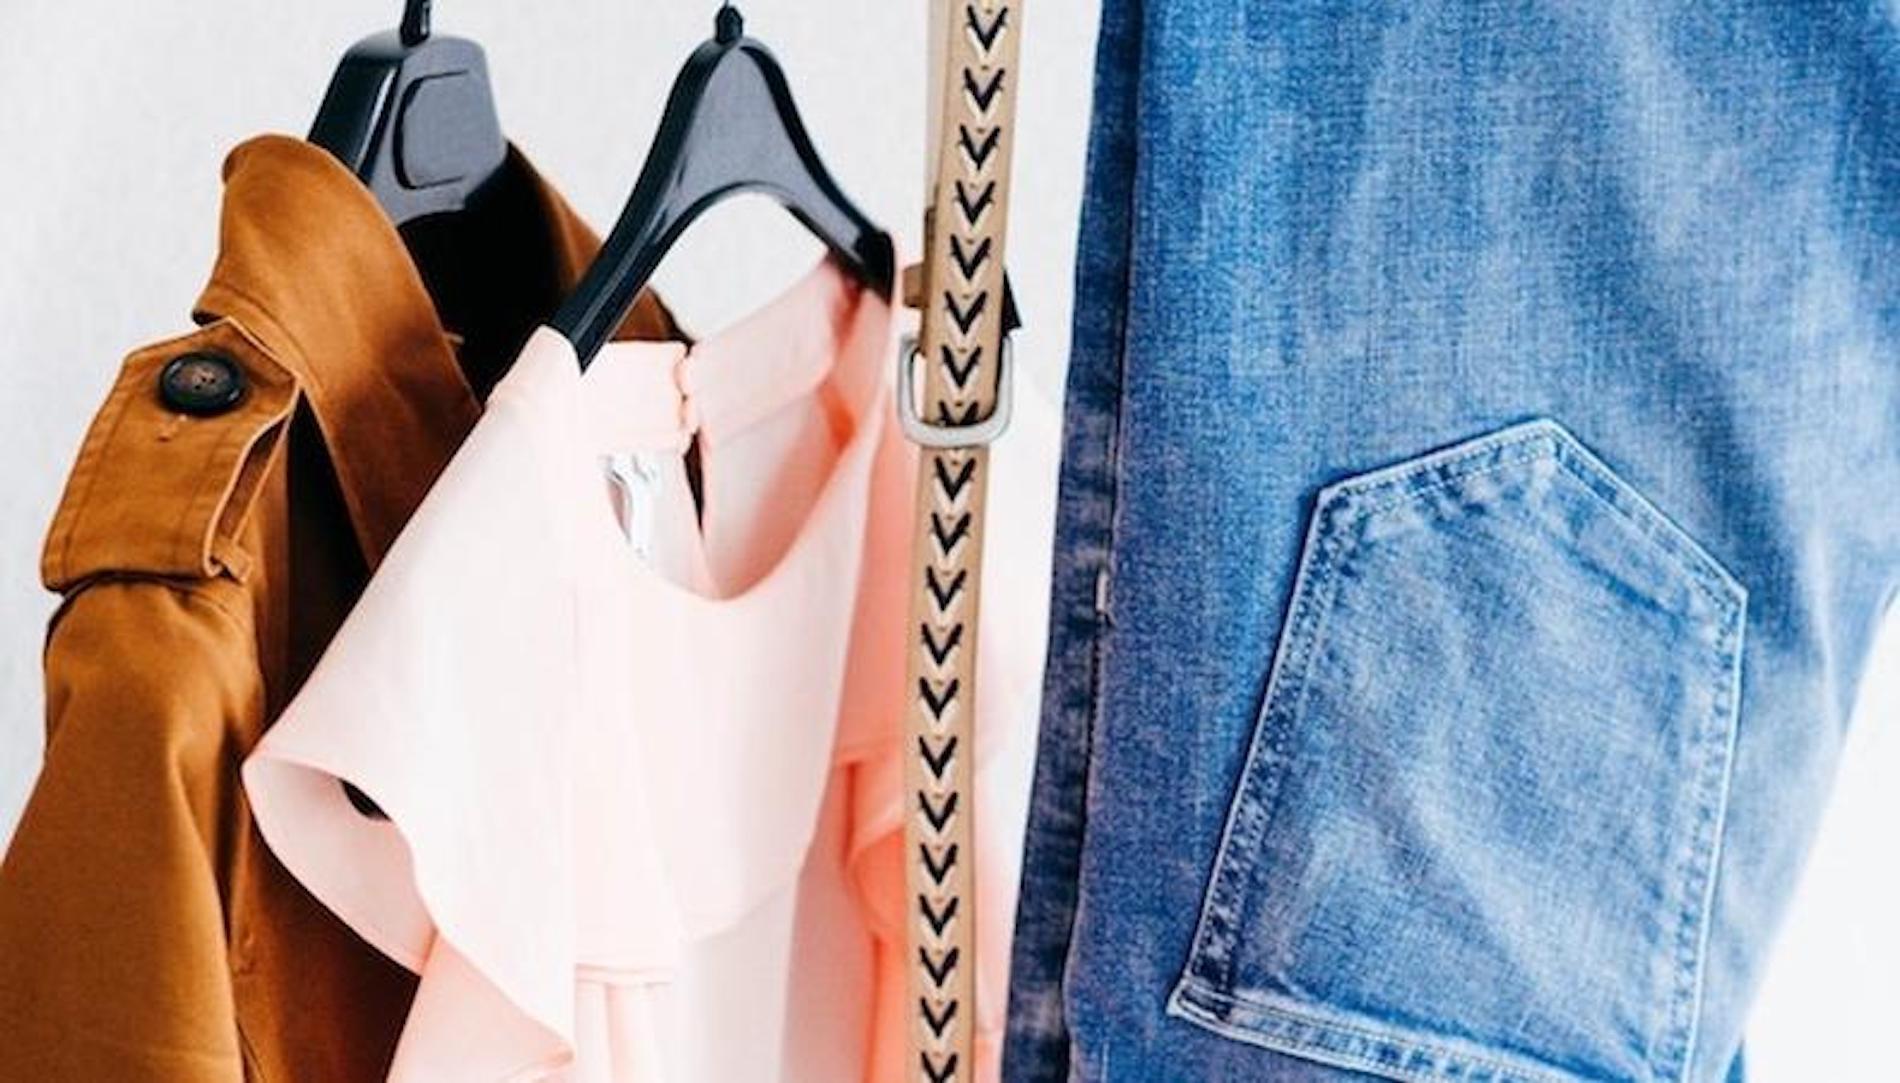 6 Tips for Choosing the Best Wardrobe for Headshots